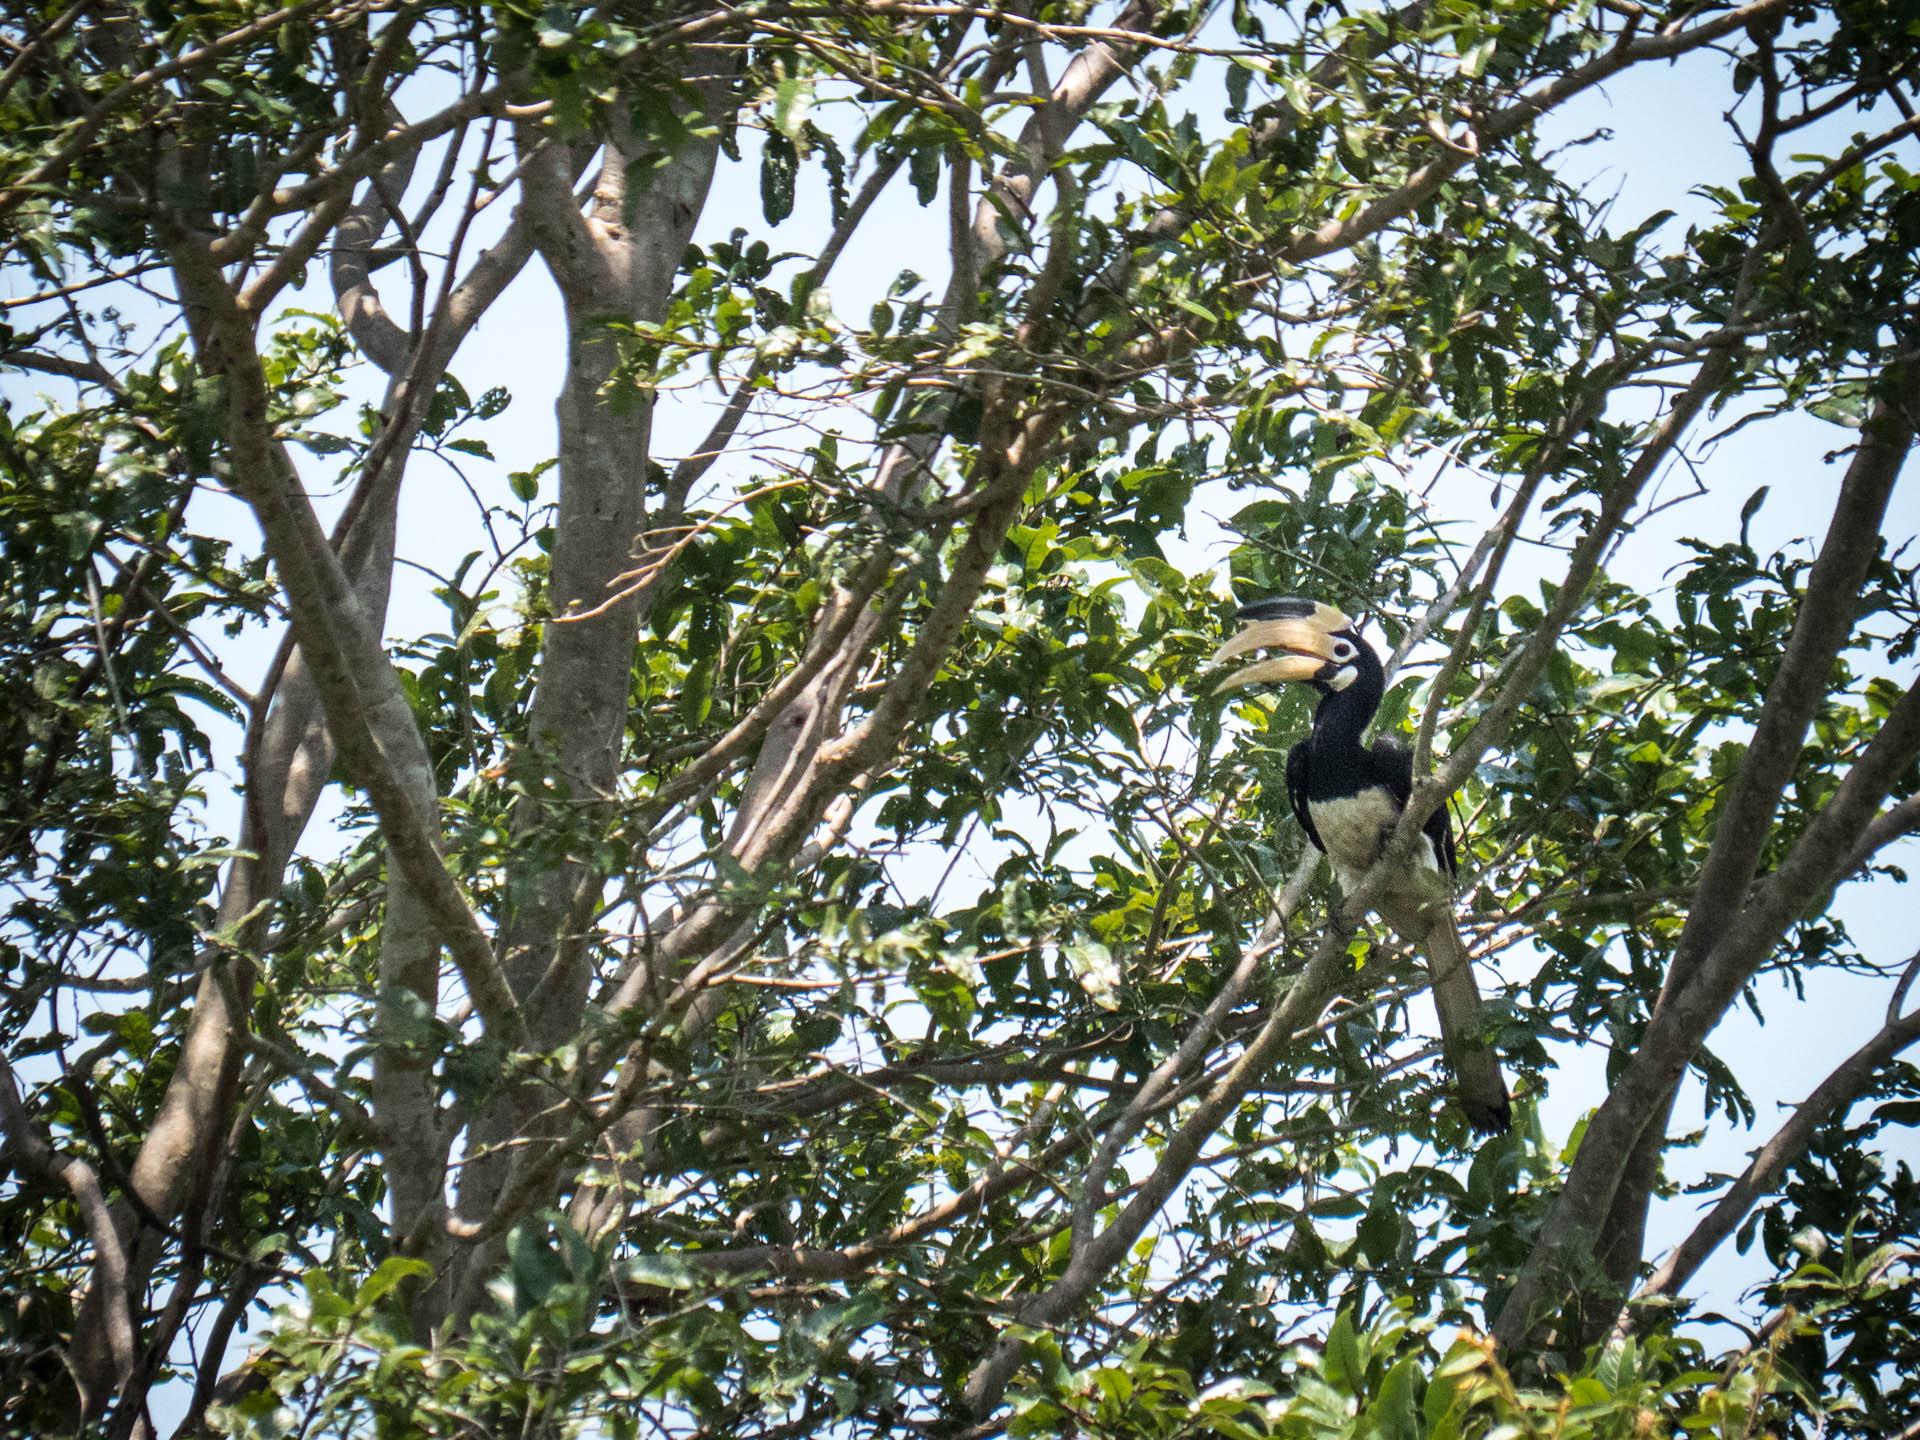 Uda walawe malabar hornbill - Les globe blogueurs - blog voyage nature